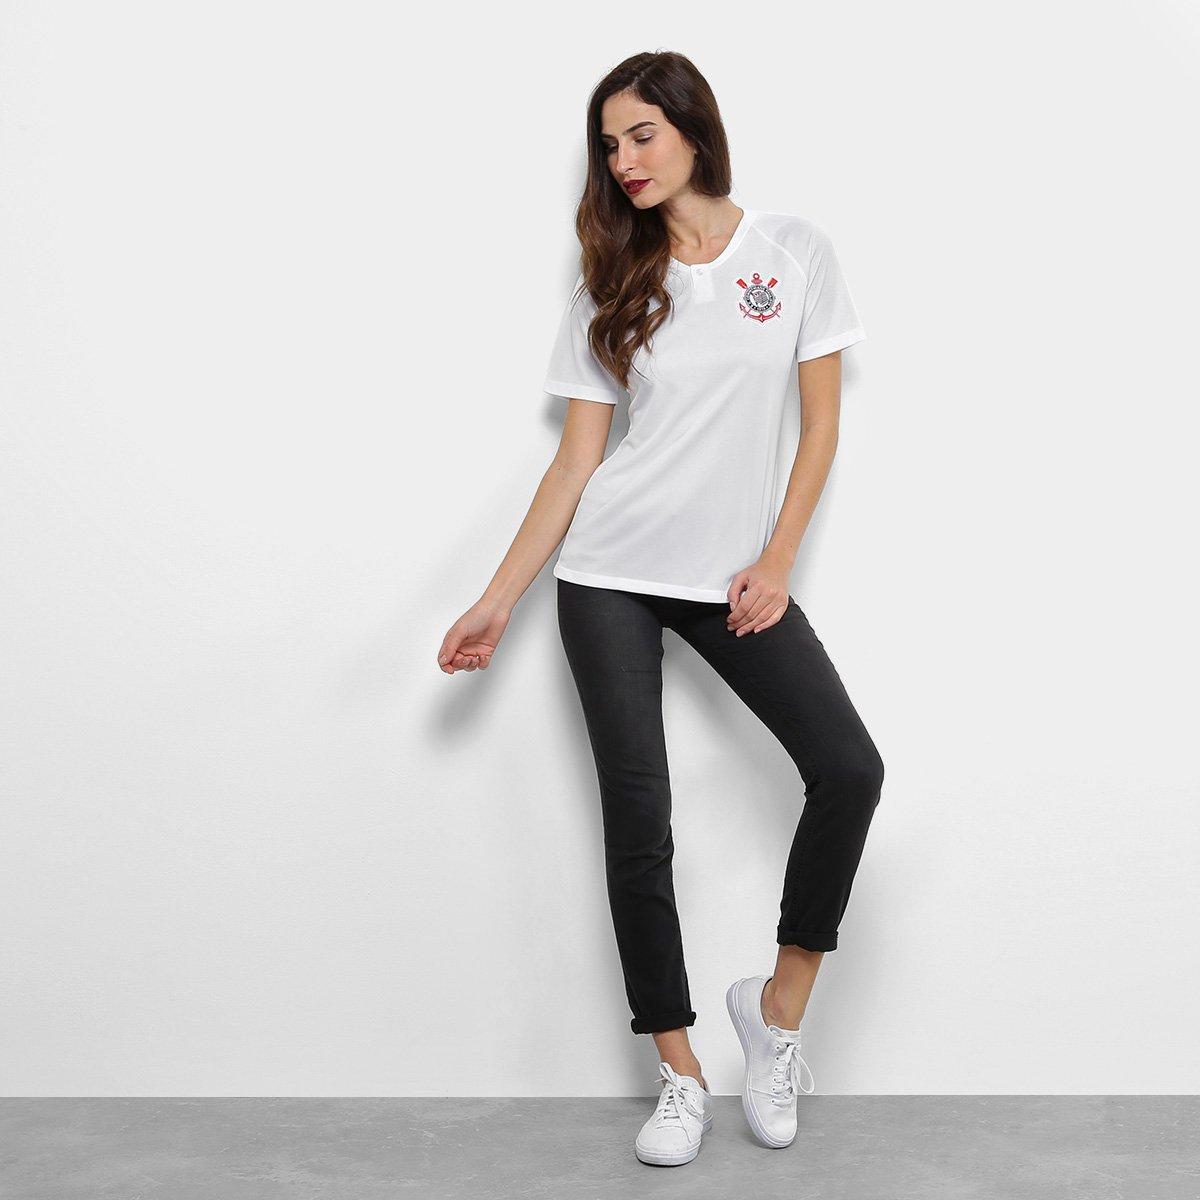 7f9737f54c Camisa Corinthians I 18 19 s n° - Torcedor Nike Feminina - Branco e ...